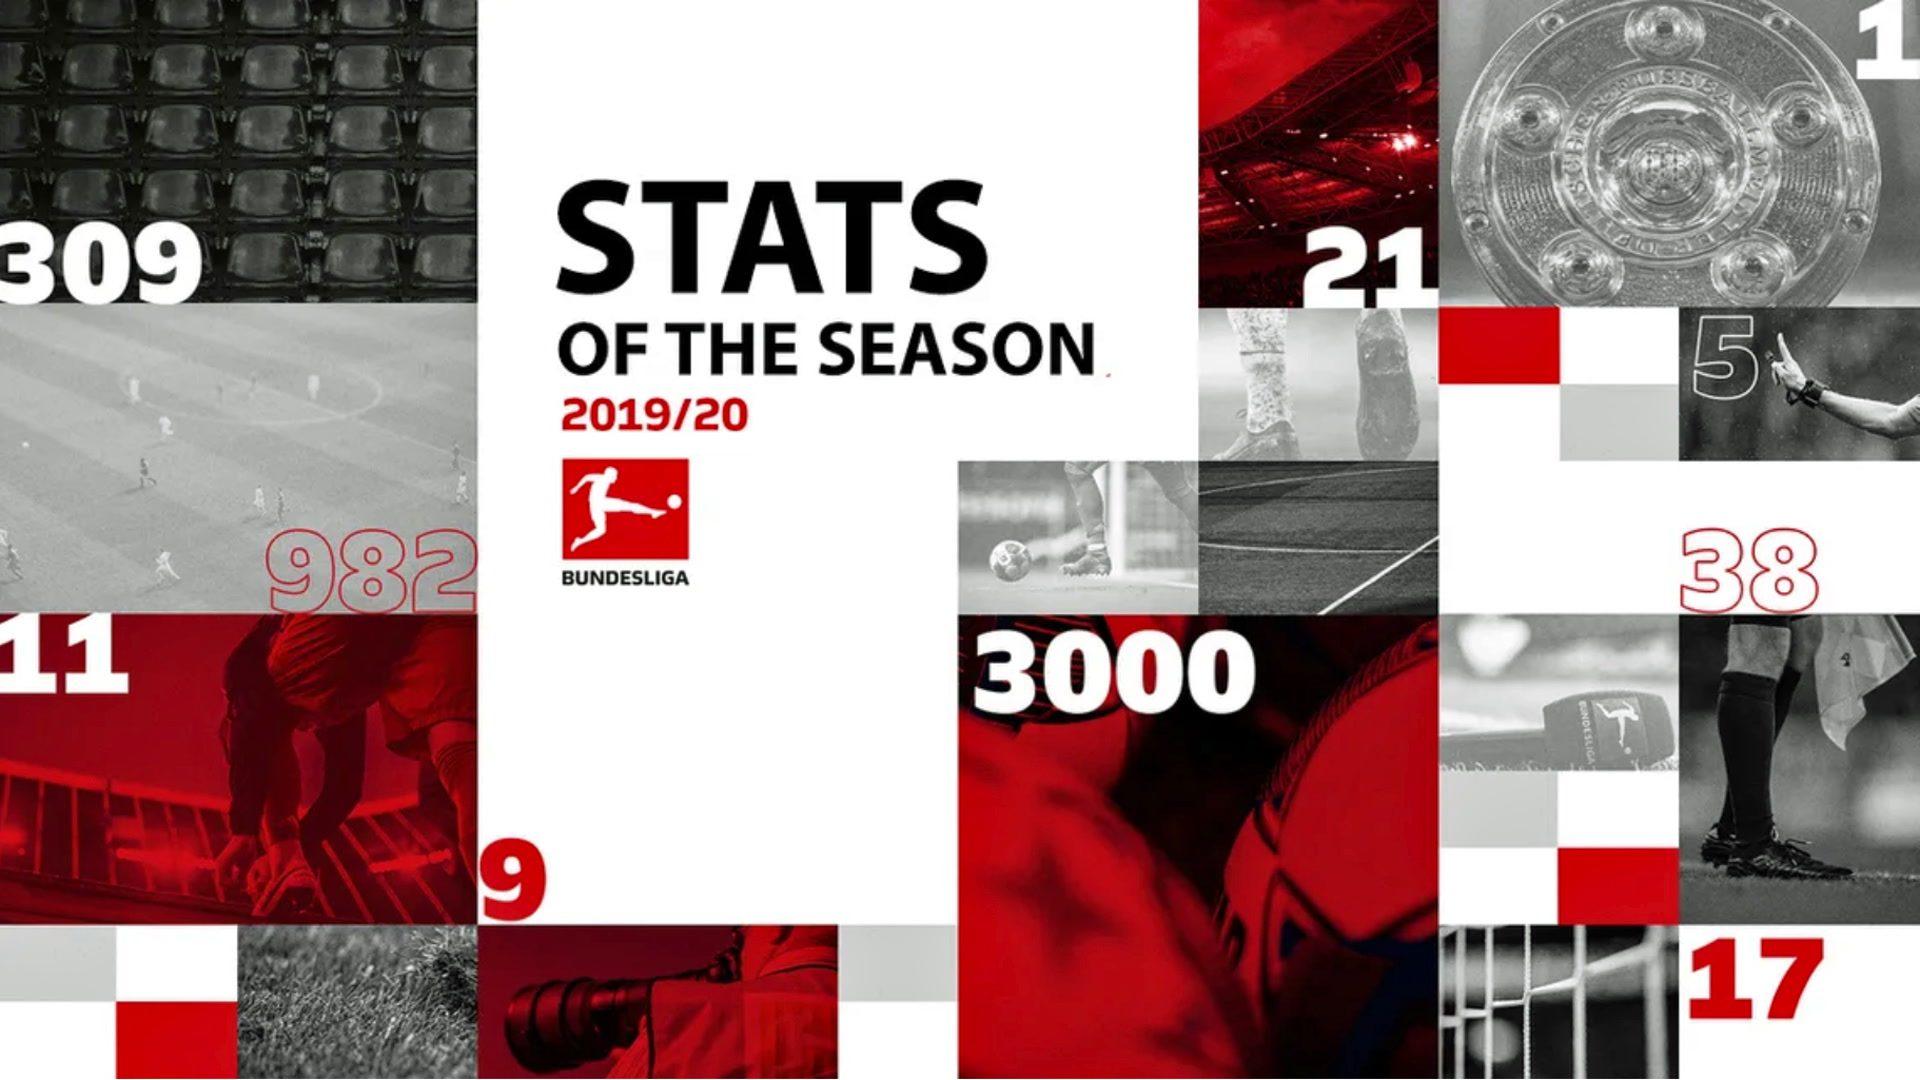 bundesliga robert lewandowski jadon sancho thomas muller and the bundesliga s season of records in 2019 20 watch new bundesliga records in 2019 20